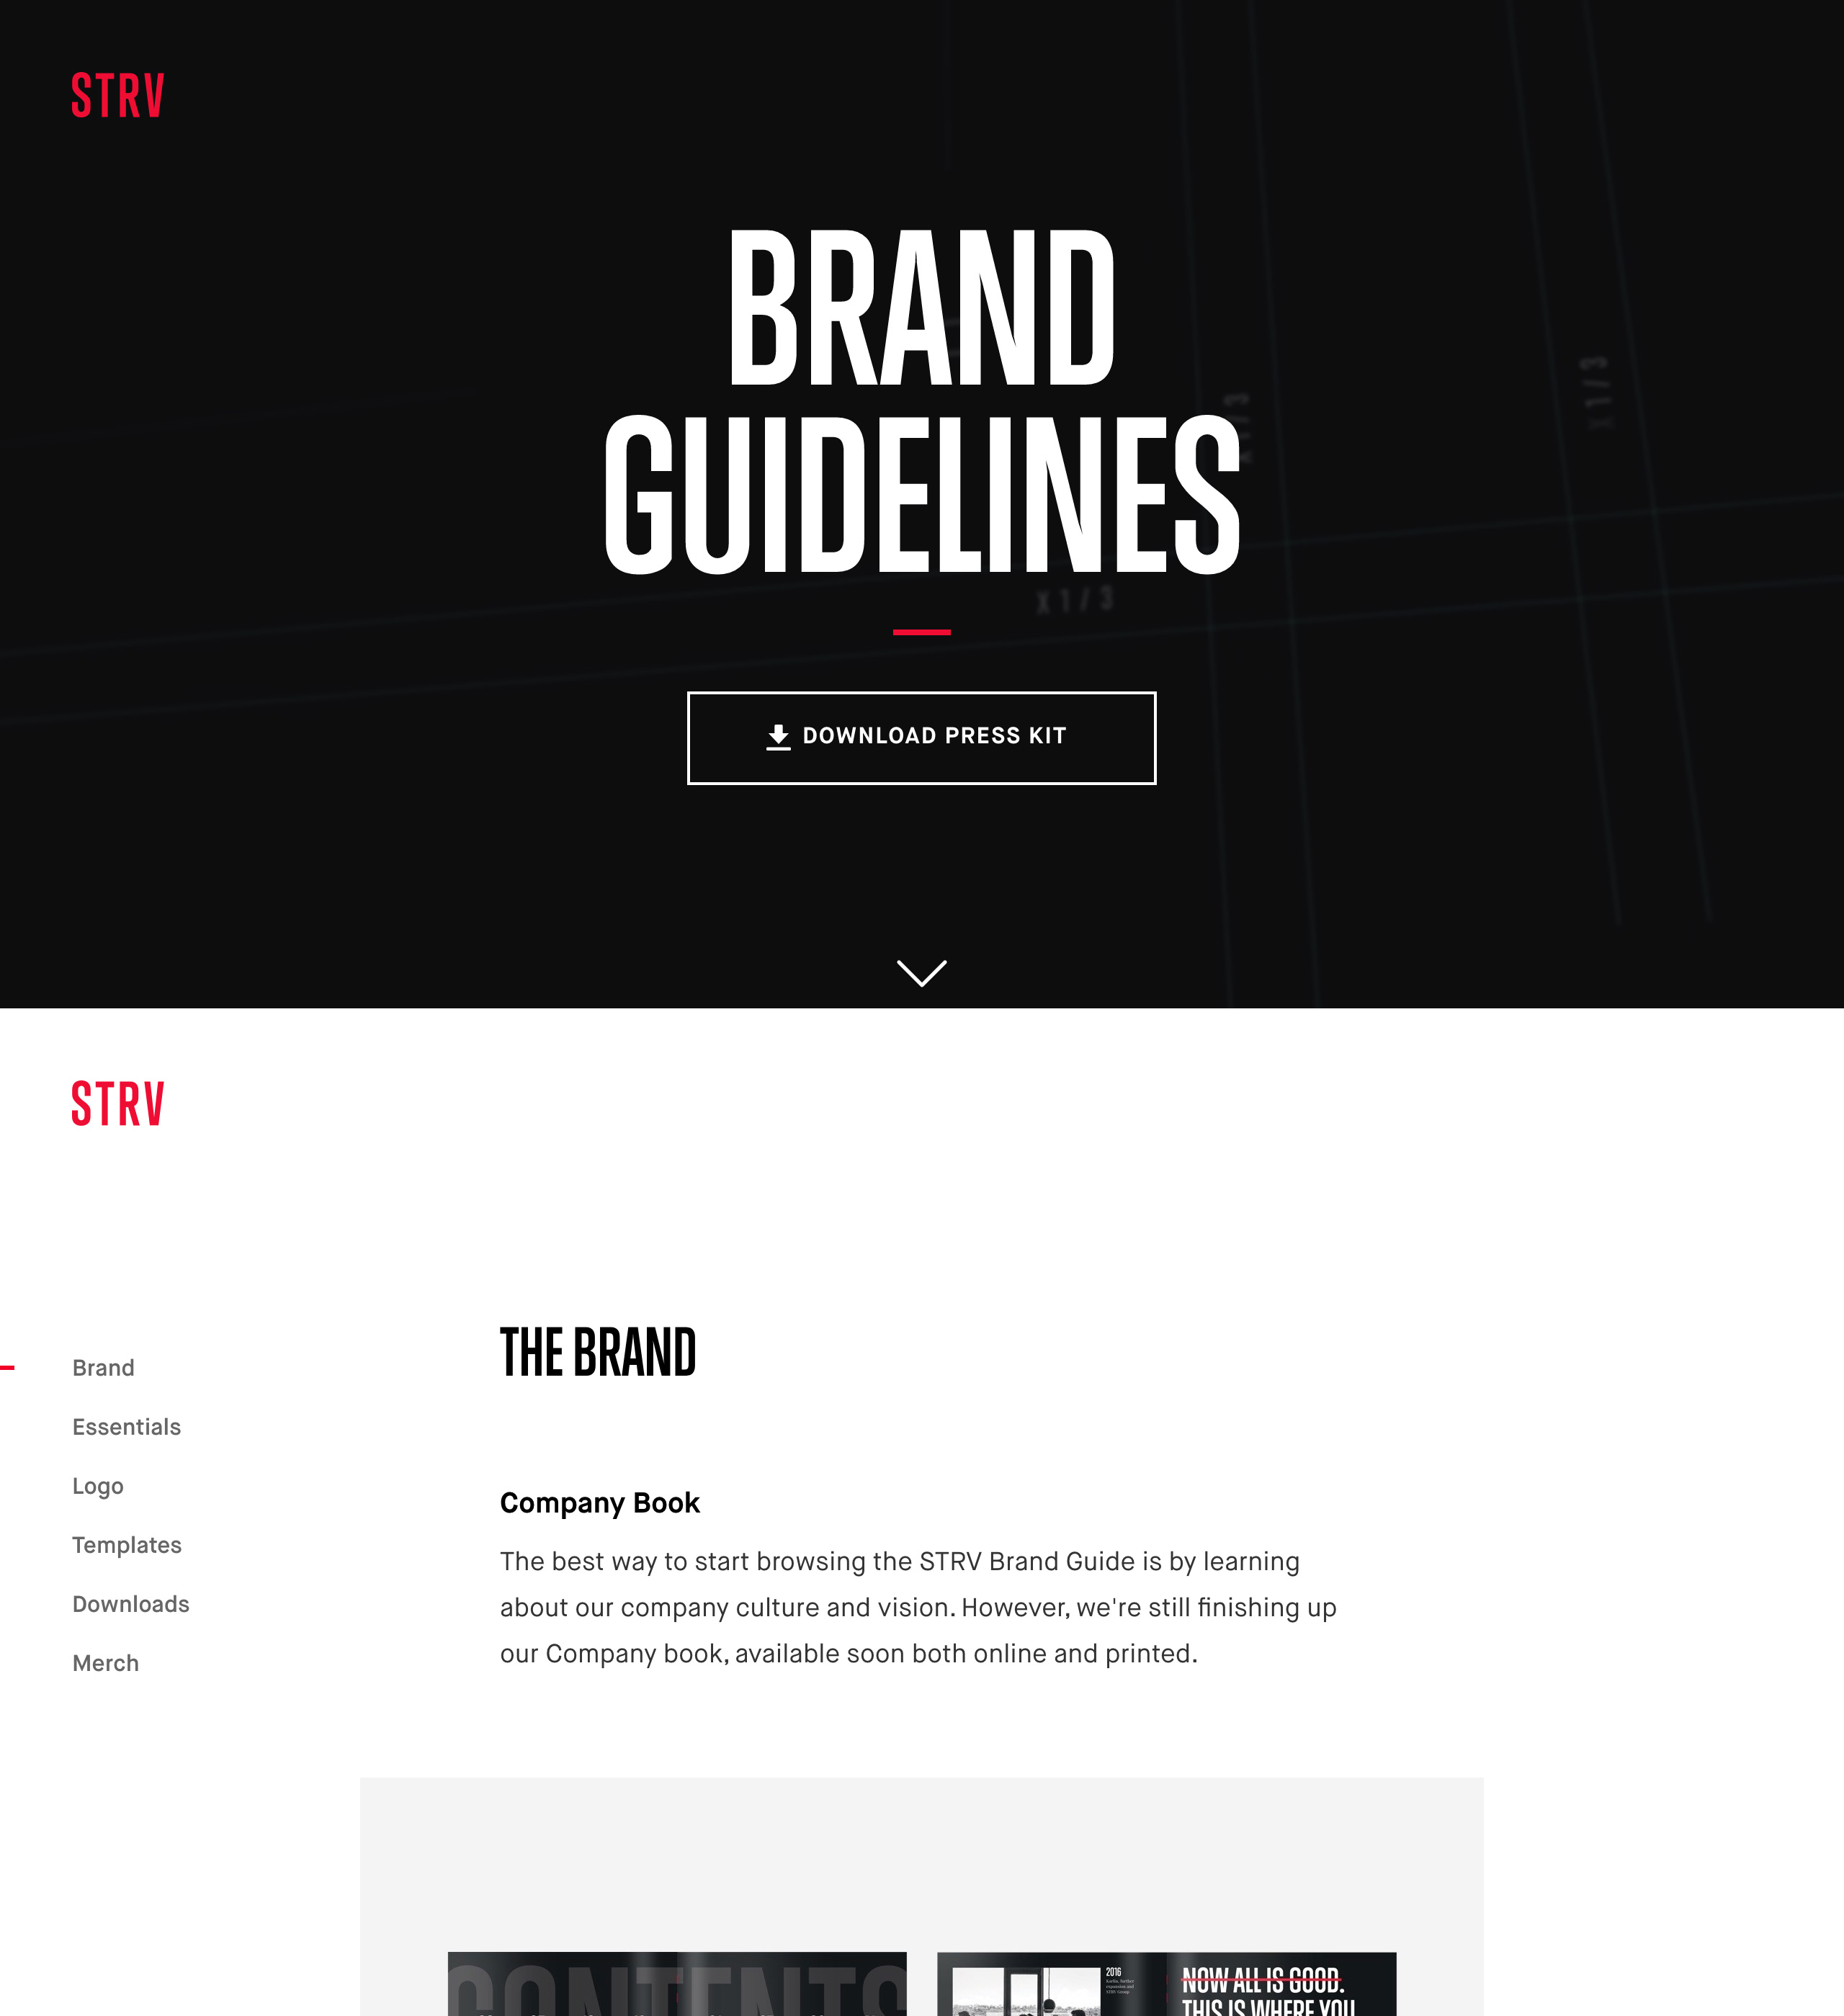 STRV Brand Guidelines Website Screenshot